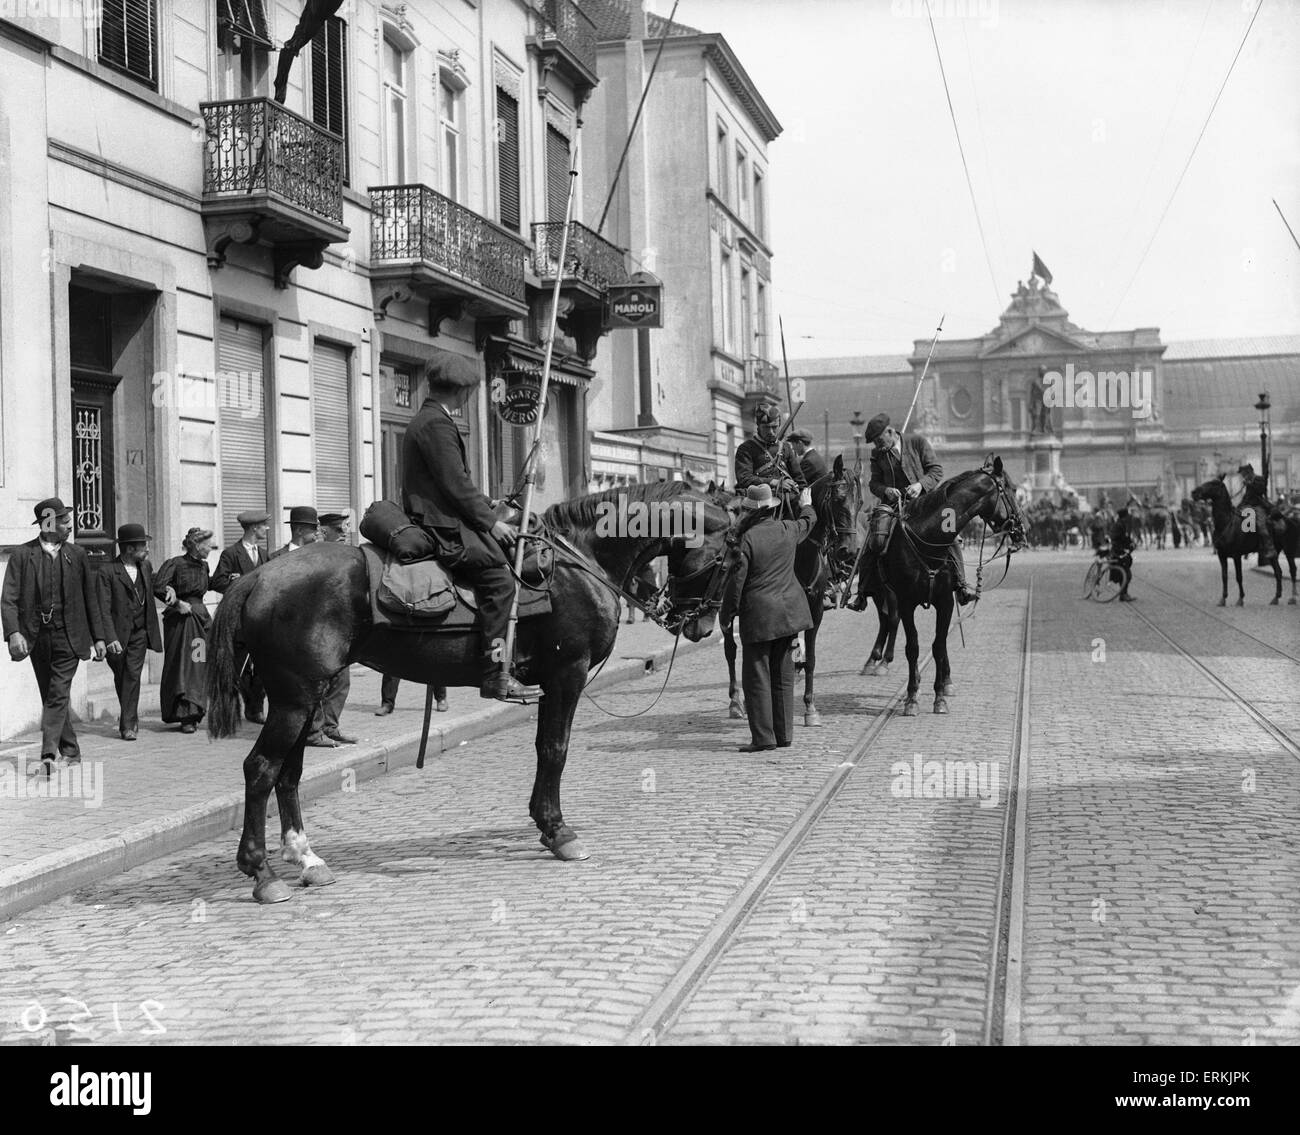 Civilian volunteers join Belgian lancers to stem the German army advance on Antwerp 22 August 1914 - Stock Image